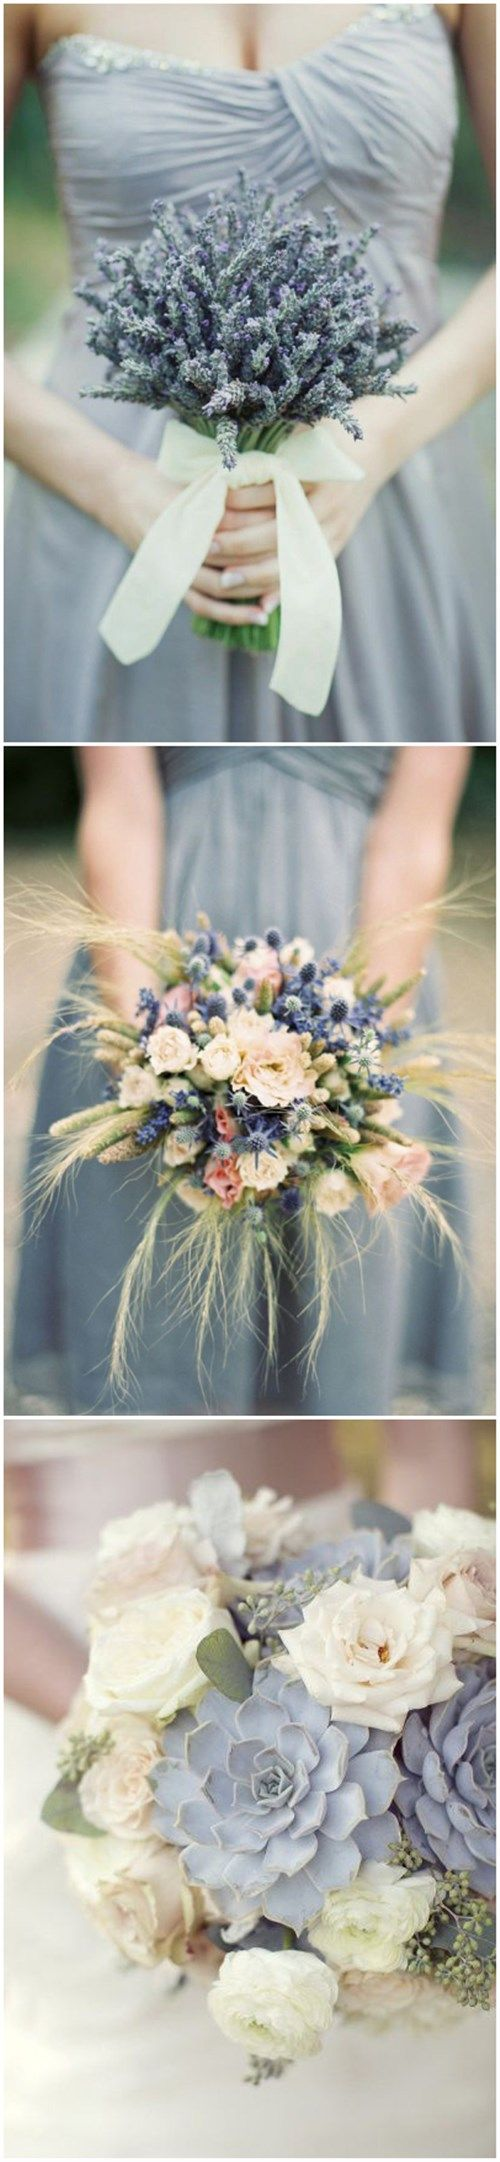 best barefoot u dreamy images on pinterest wedding ideas